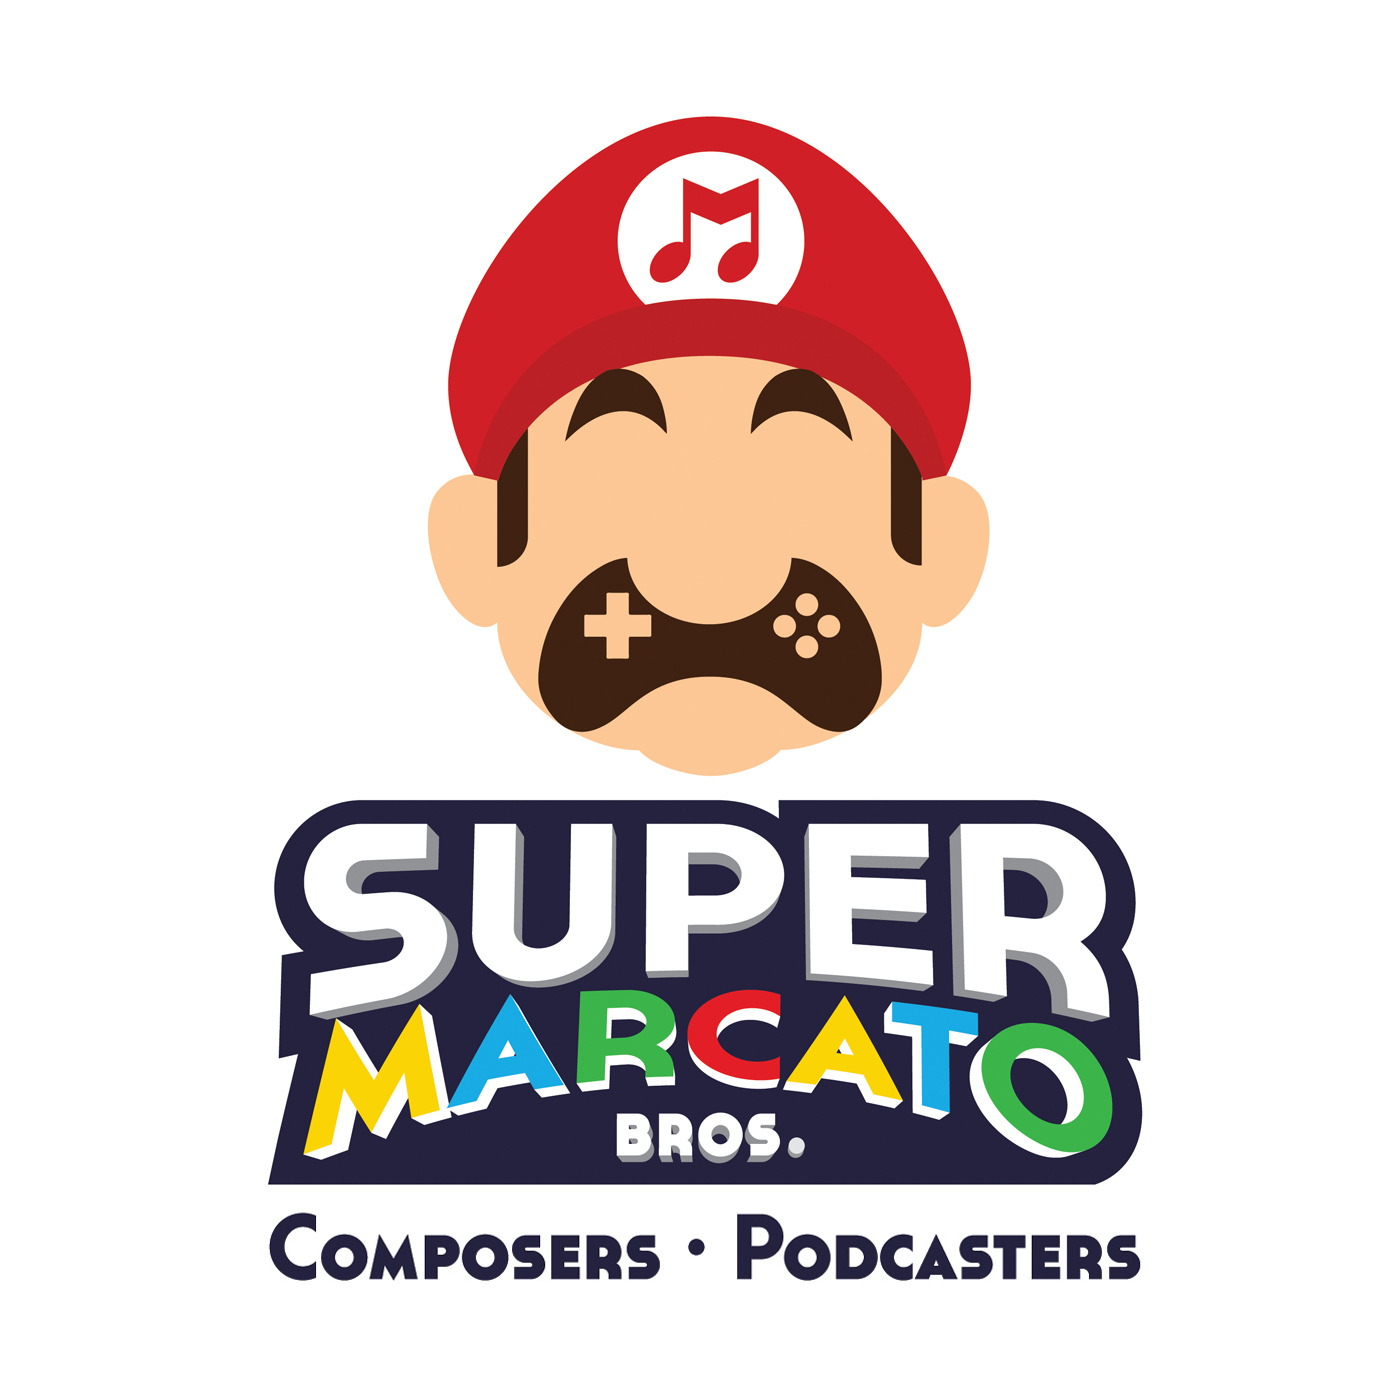 www.supermarcatobros.com